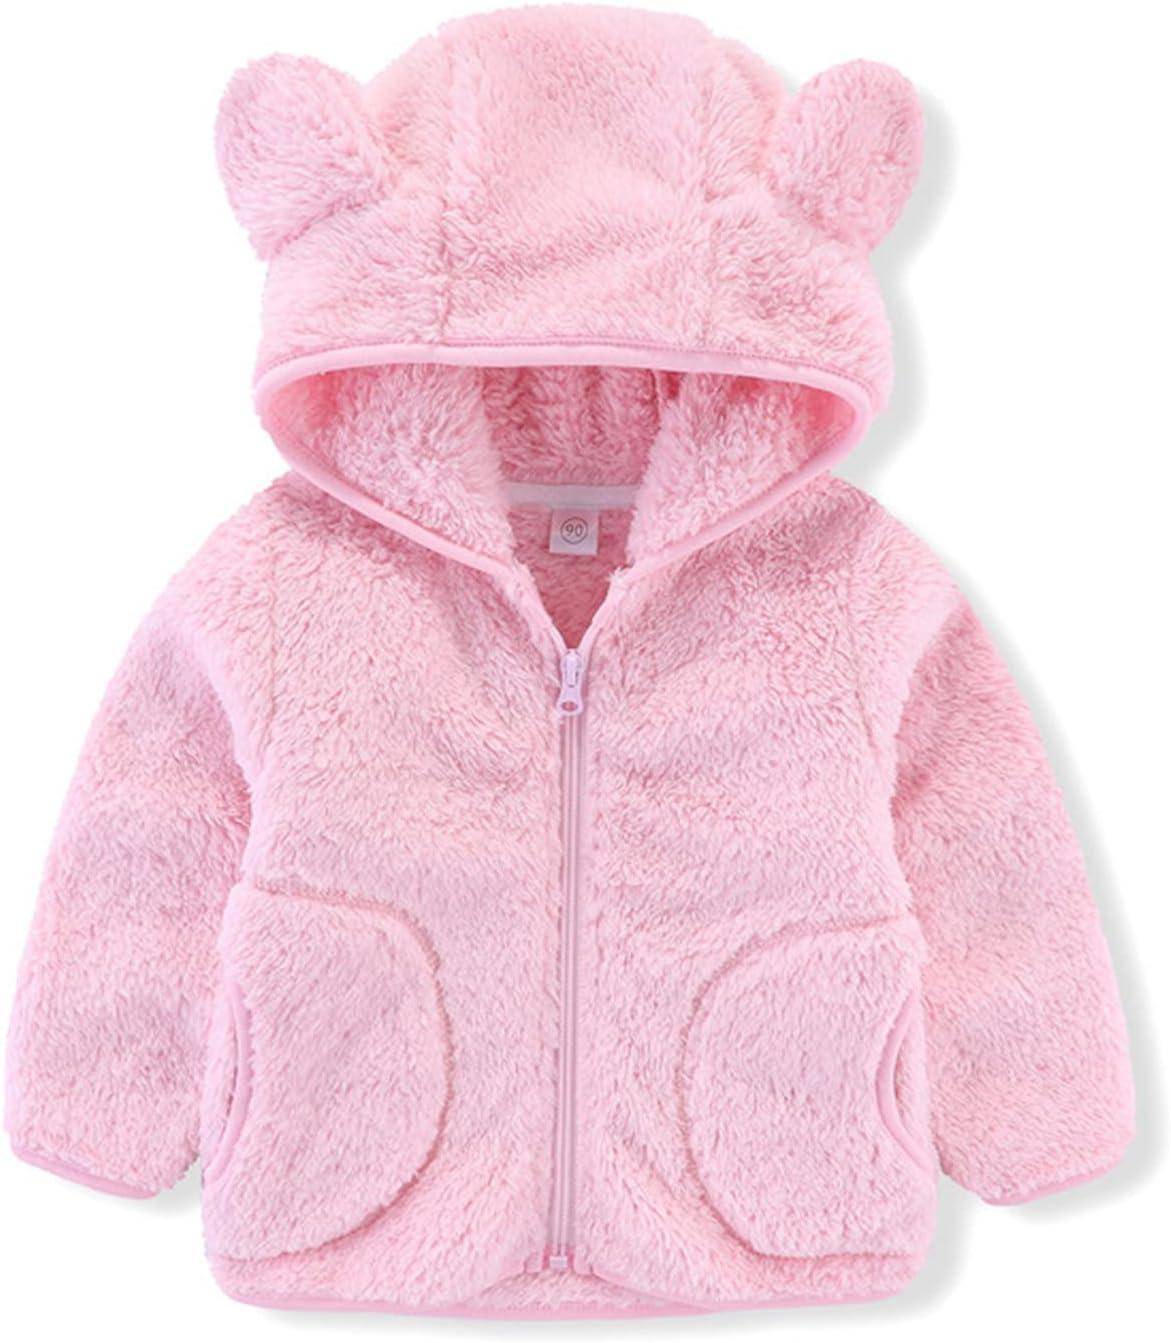 Baby Kids Boys Girls Fleece Full Zip So Up Bear Hoodie with Ears NEW before selling Max 79% OFF ☆